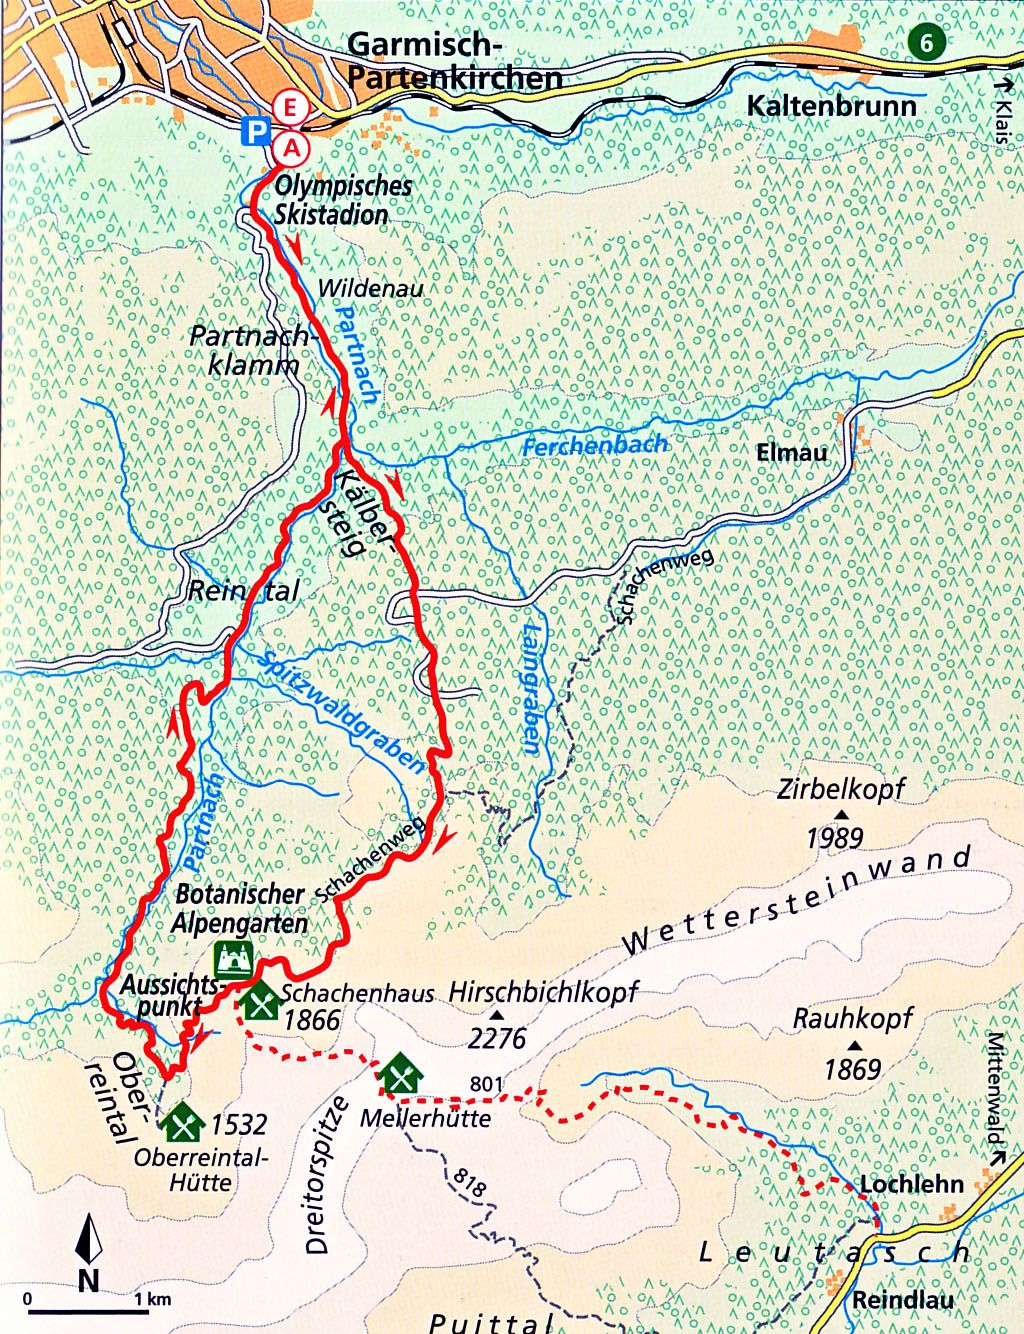 Map Of Germany Garmisch.Partnachklamm Garmisch Partenkirchen Germany Gotta Get Outta